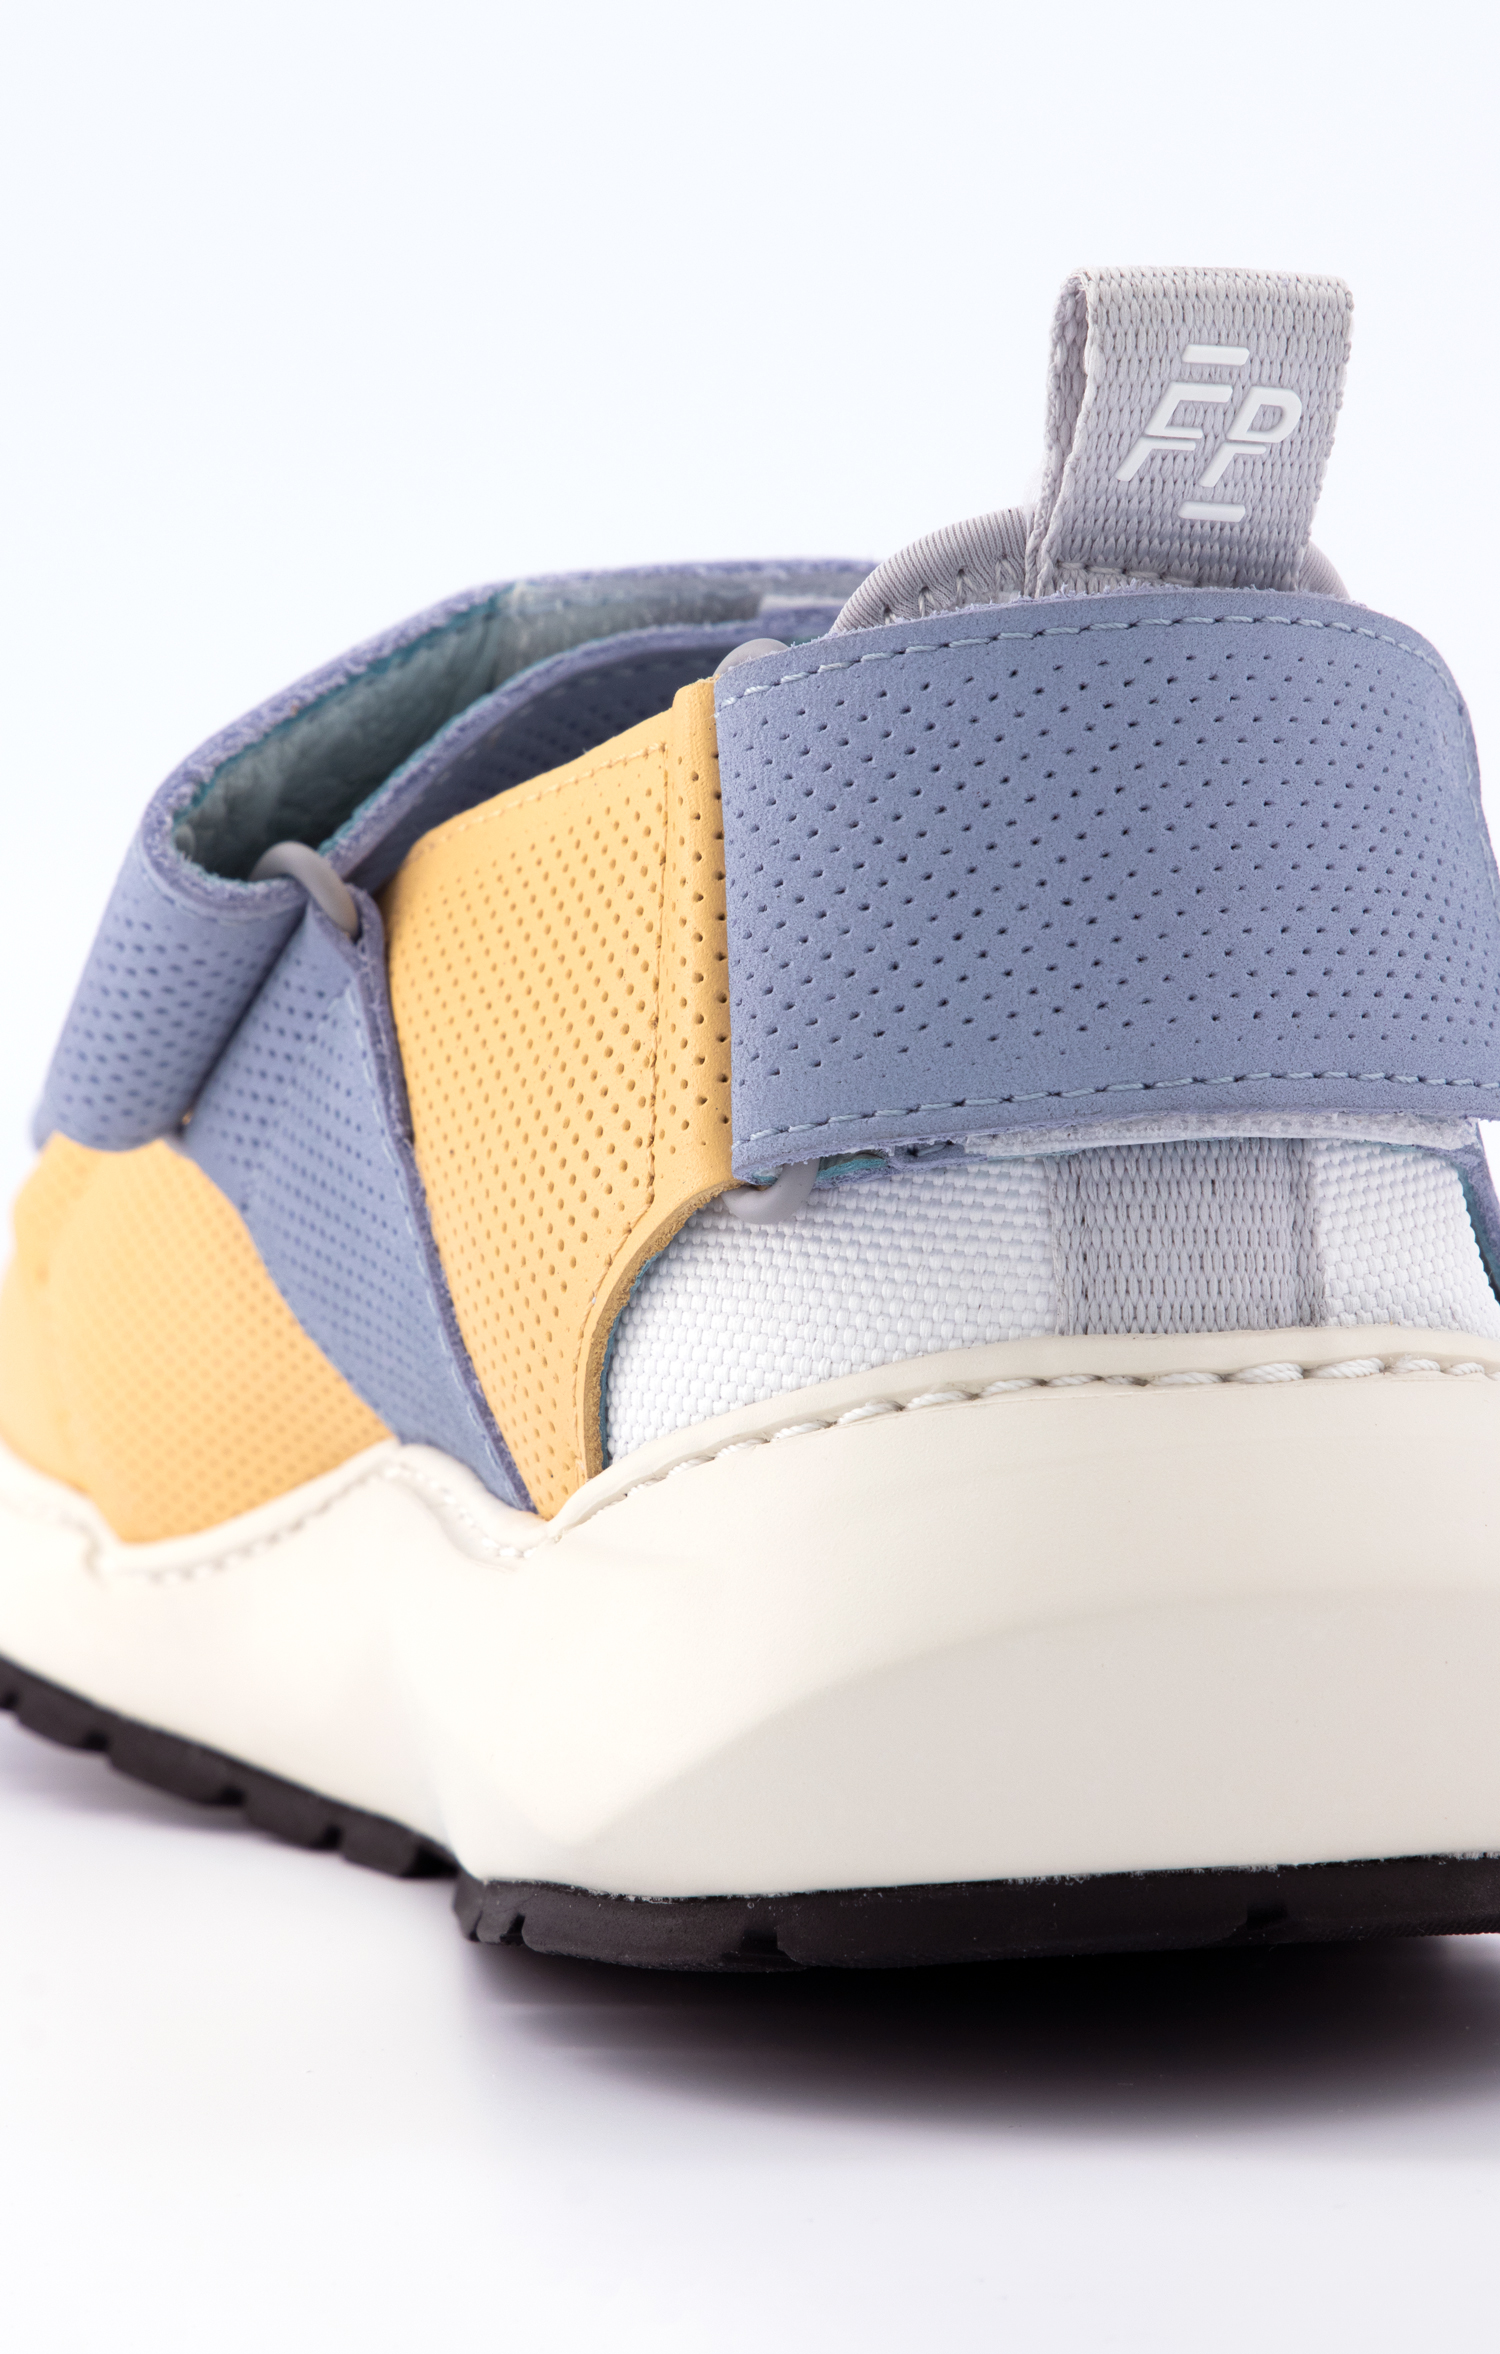 Fpieces-sandals-Detail-CR2-2.jpg